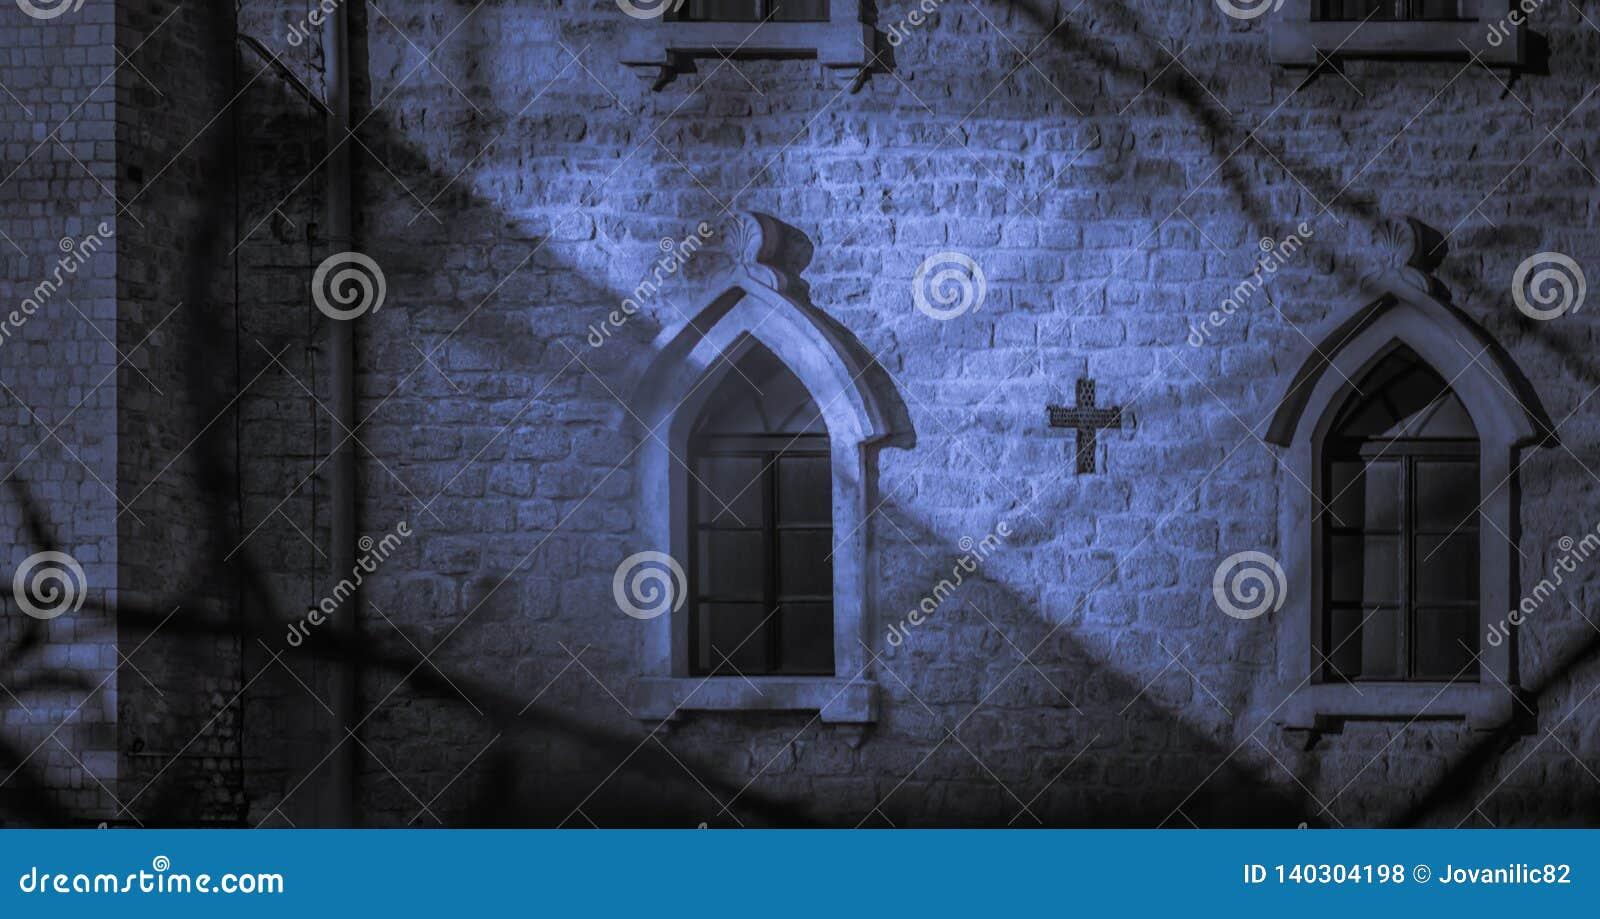 Catholic church at night, moonlight shadows